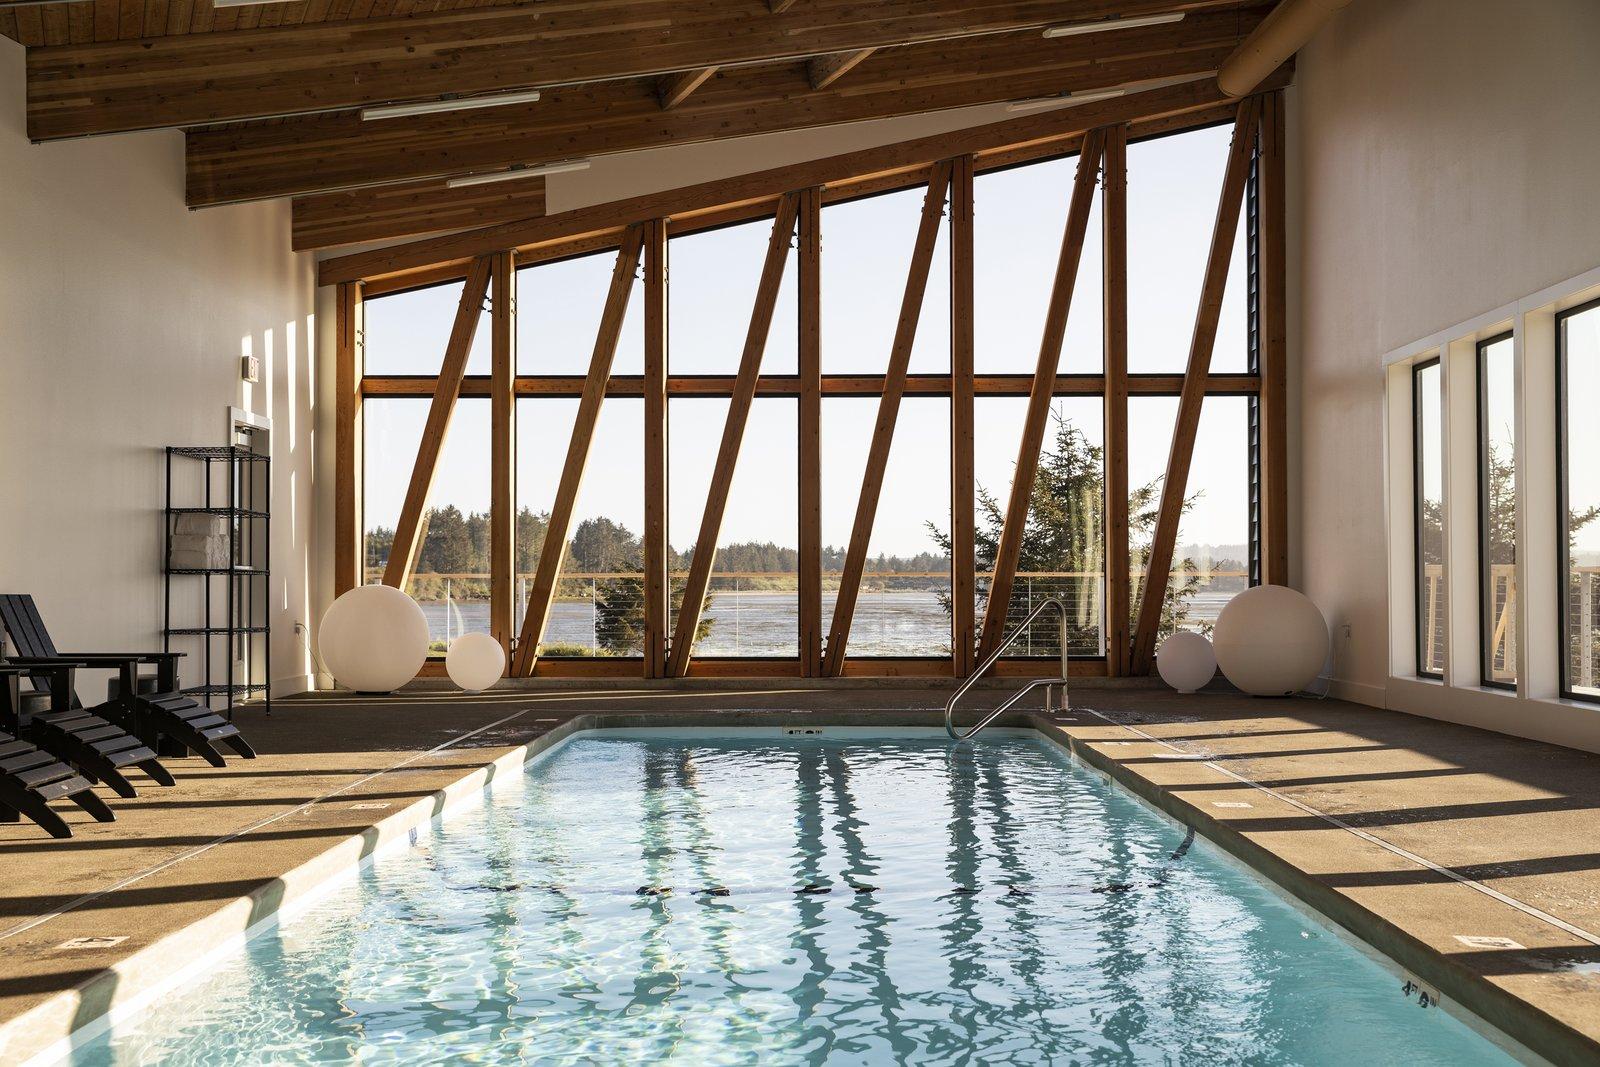 OFFICEUNTITLED JHL Design Bay Point Landing indoor pool